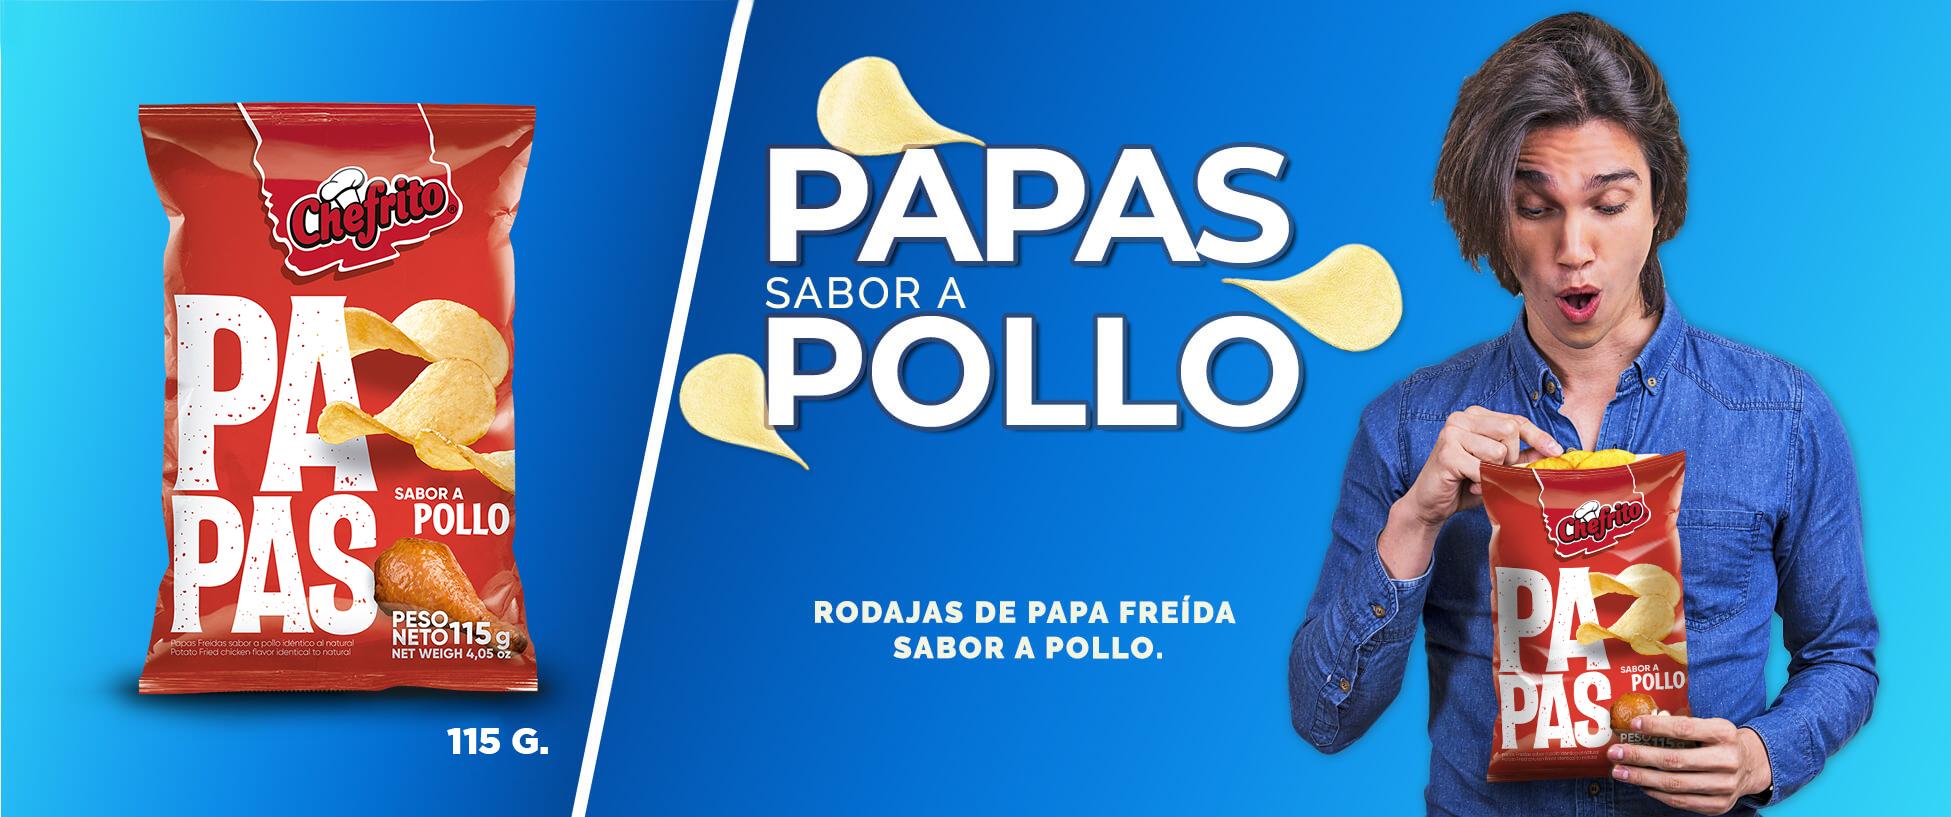 Papas 5